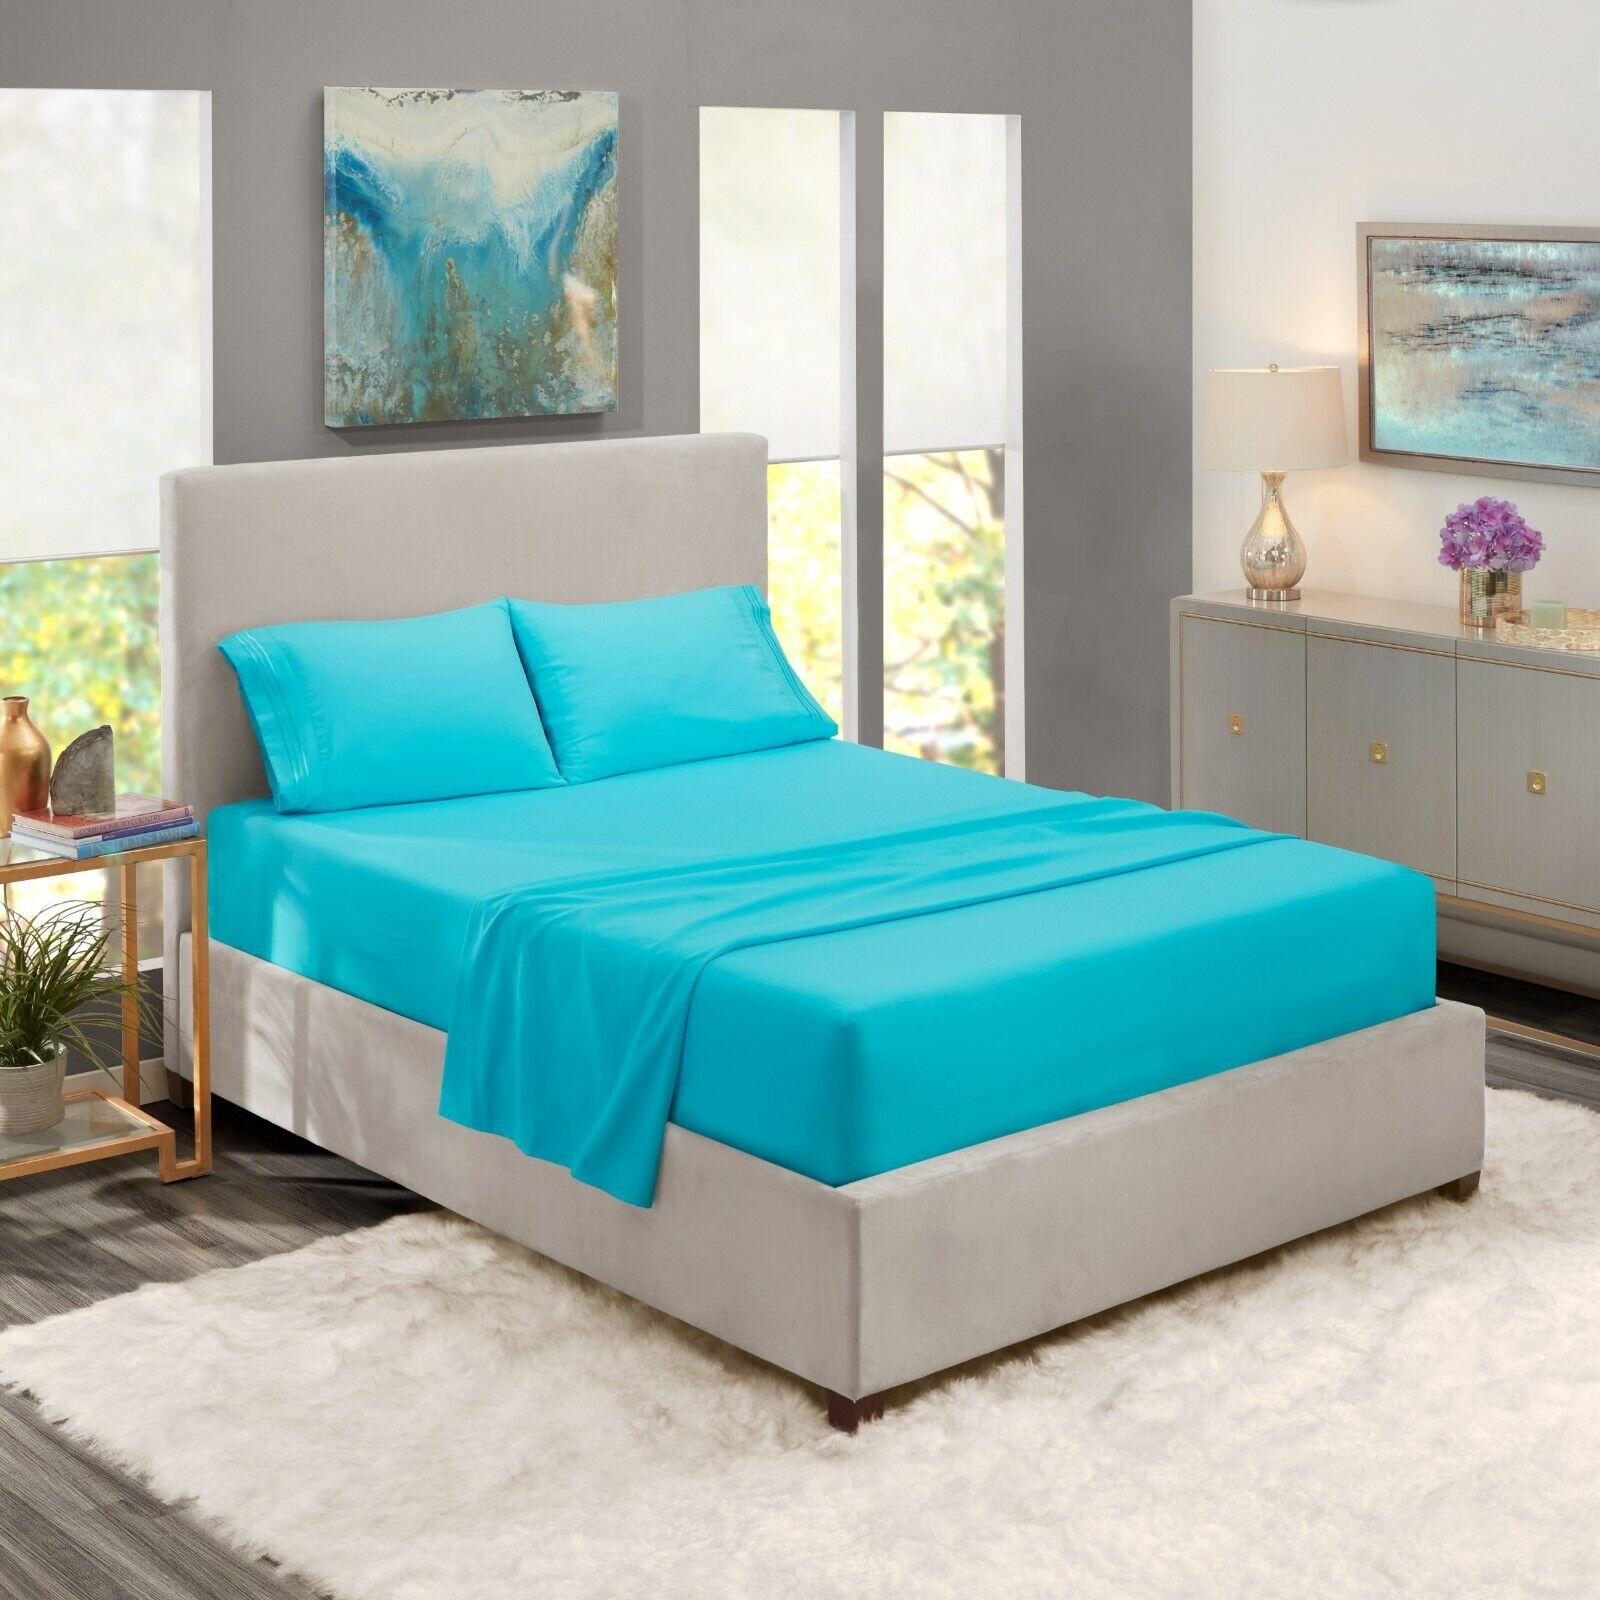 Egyptian Comfort 1800 Count 4 Piece Bed Sheet Set Deep Pocket Bed Sheets